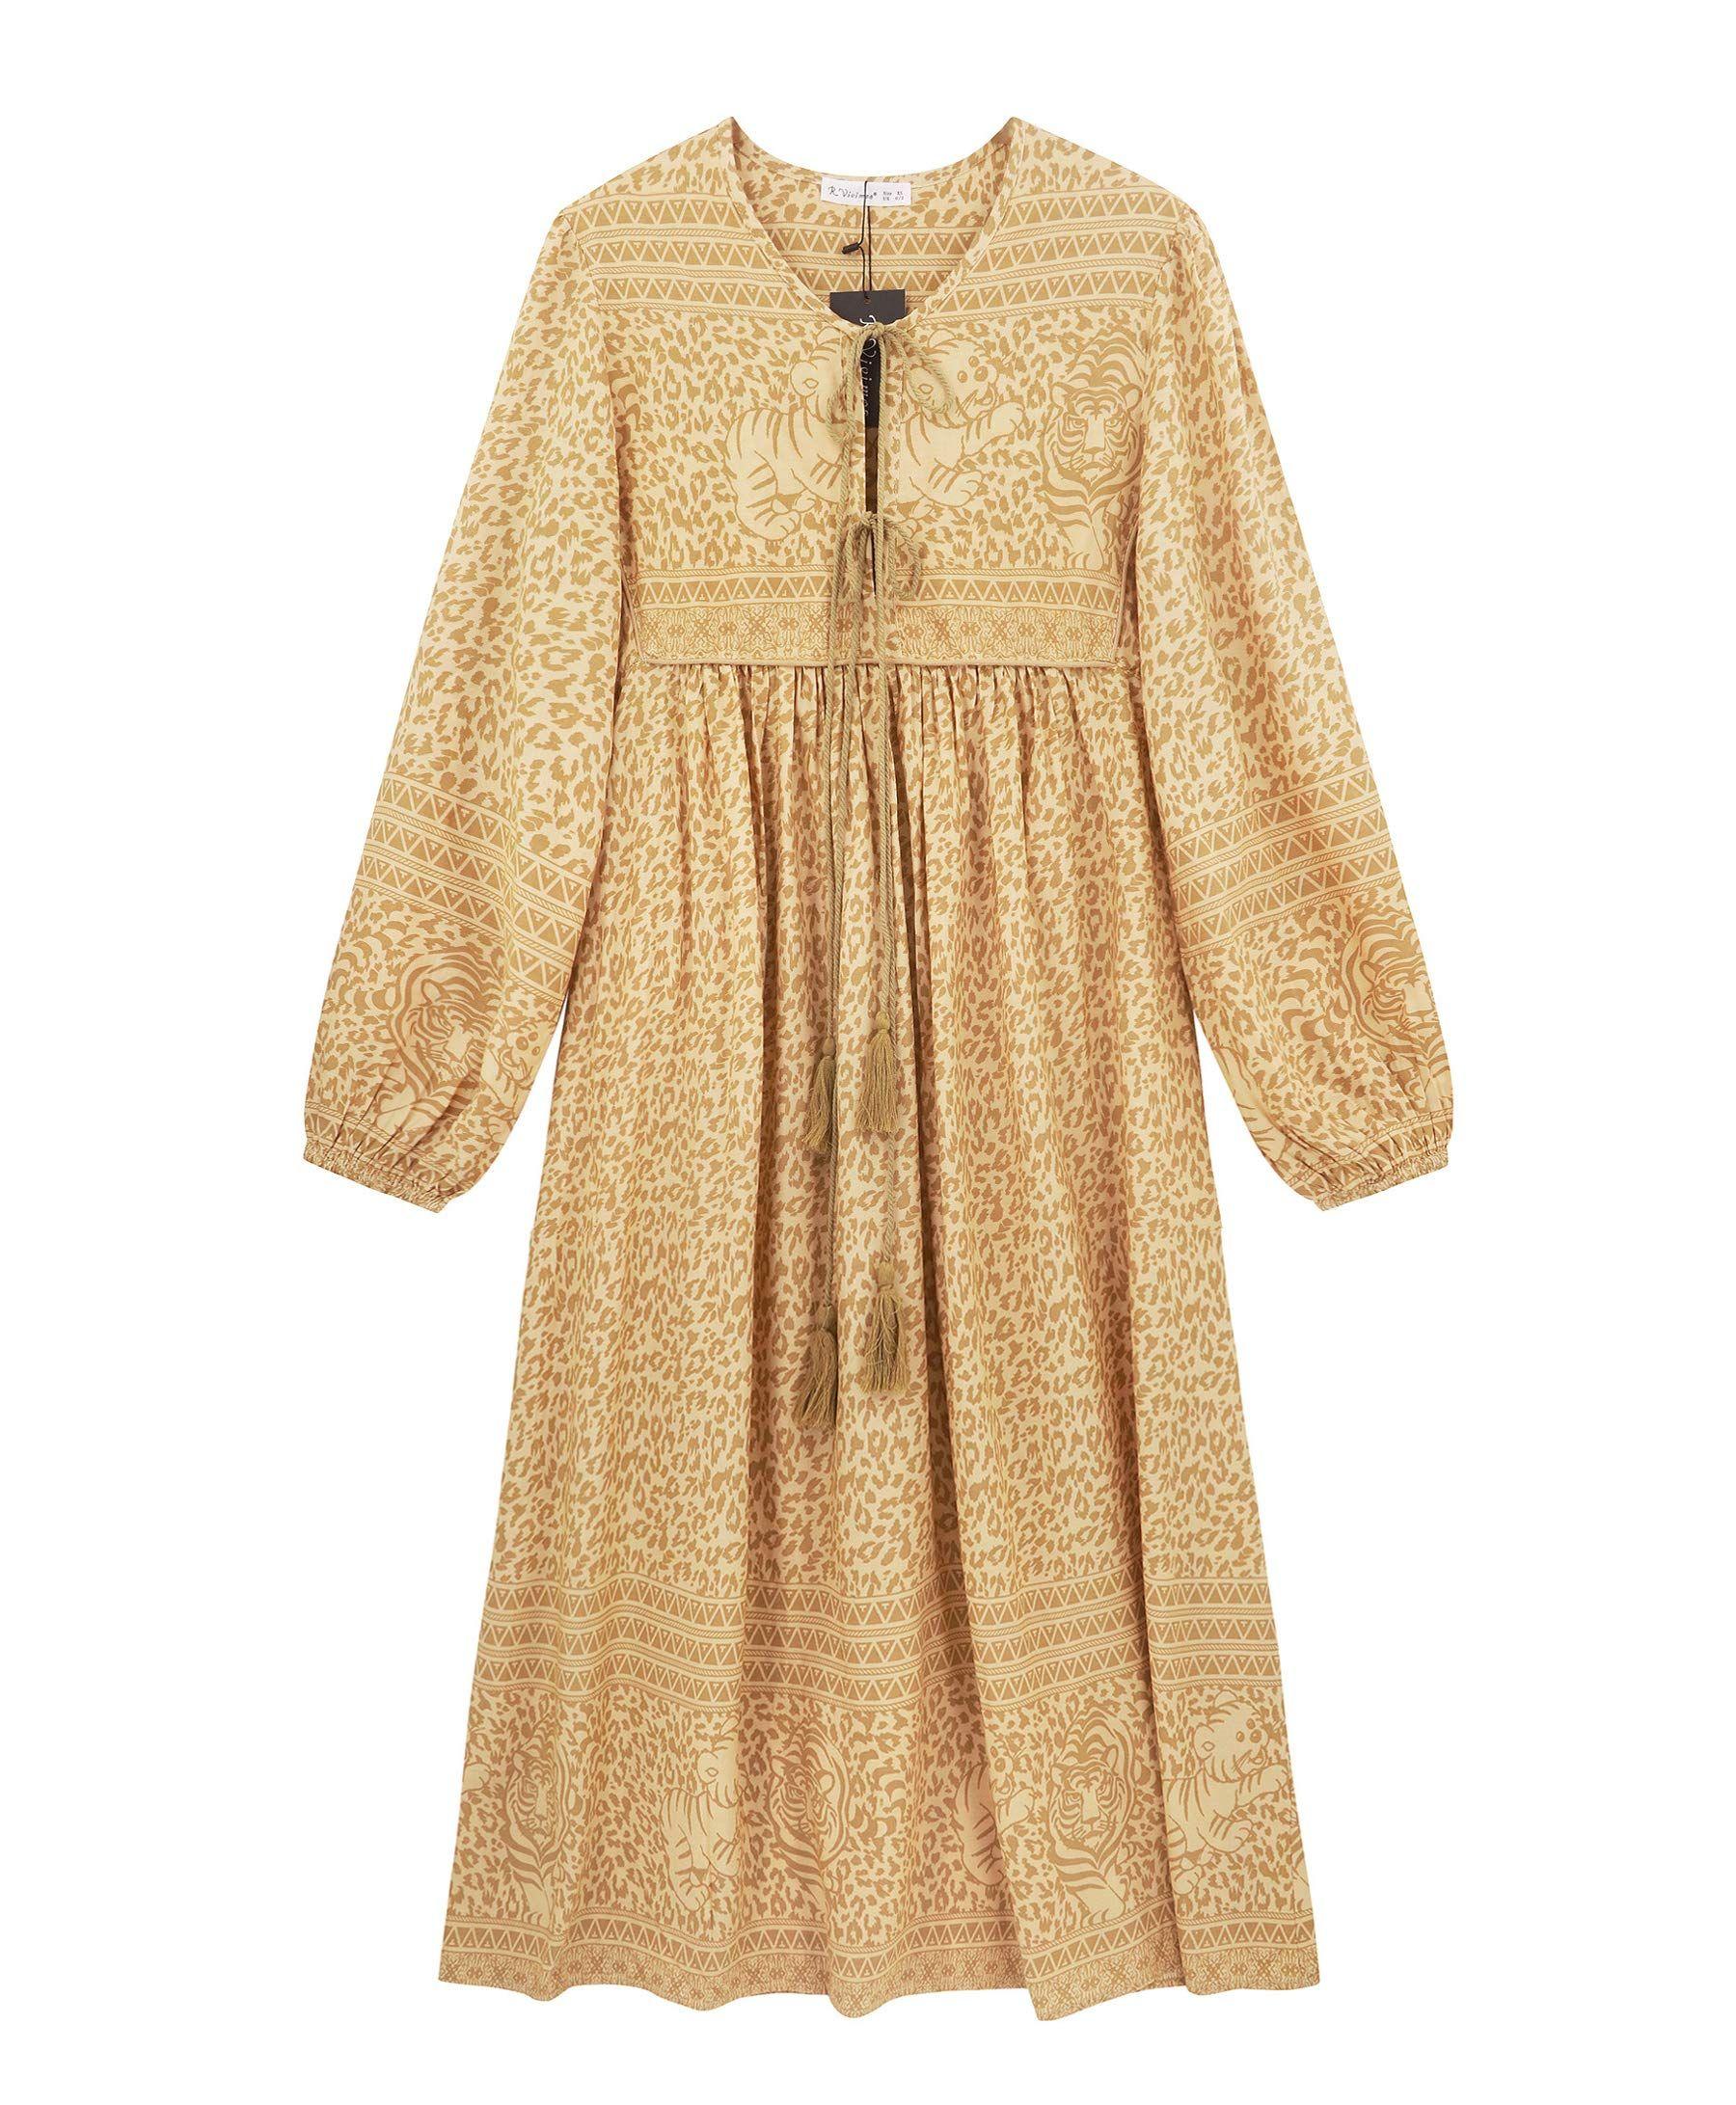 35 Oversized Dresses To Waft Around The House In Bohemian Midi Dress Oversized Dress Women Long Sleeve [ 2183 x 1800 Pixel ]